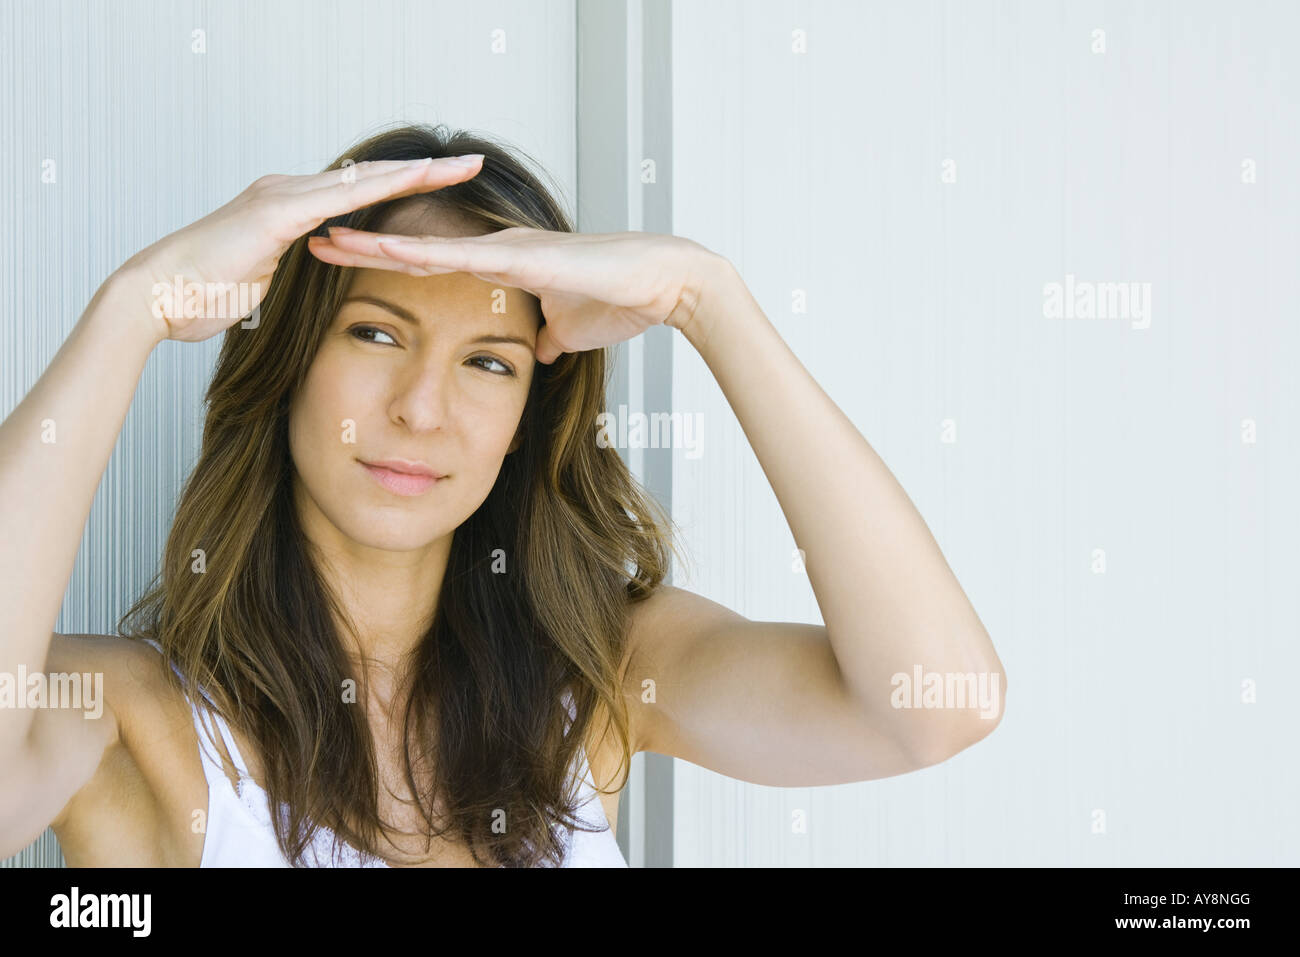 Woman shading eyes, looking away, close-up - Stock Image